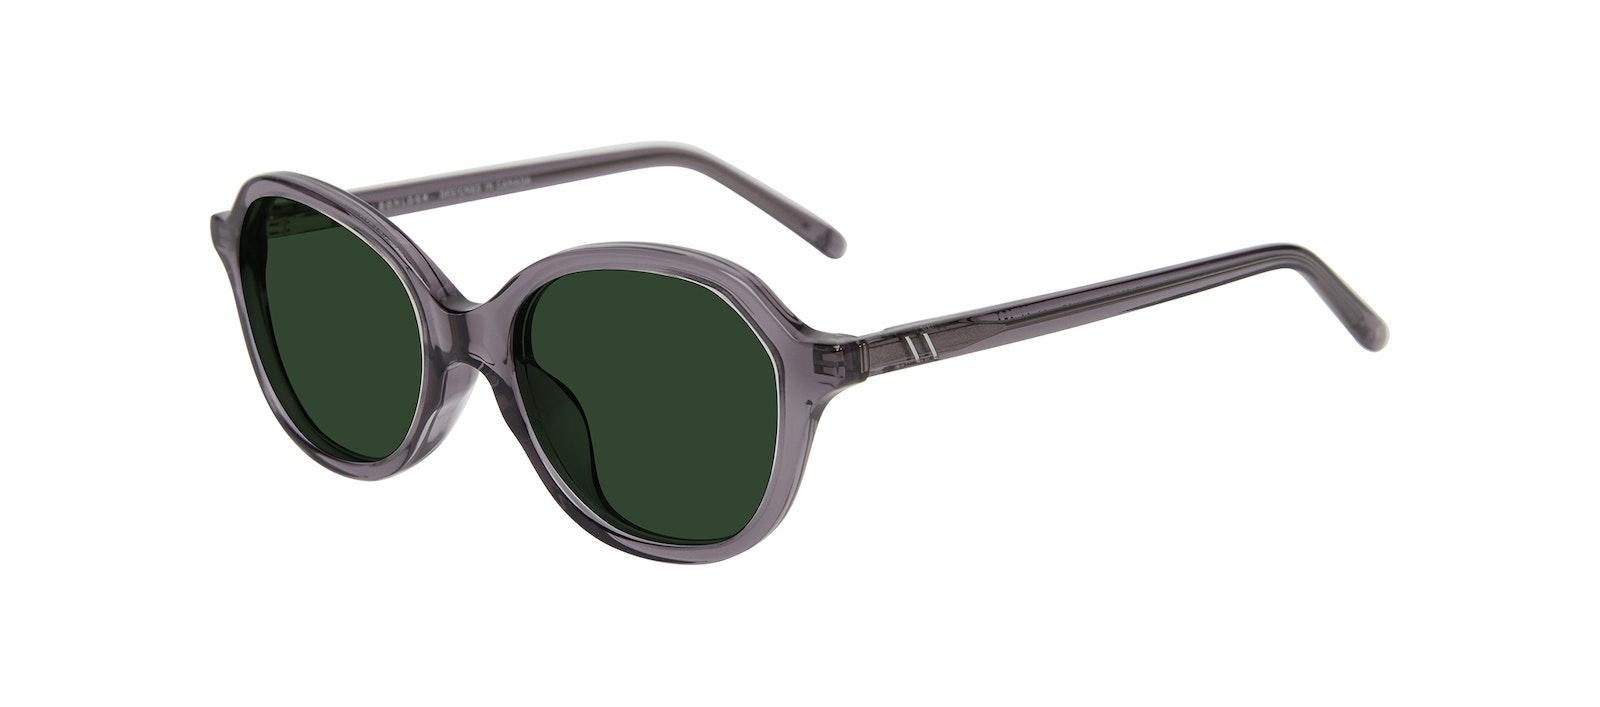 Affordable Fashion Glasses Square Sunglasses Kids Stage Junior Grey Tilt